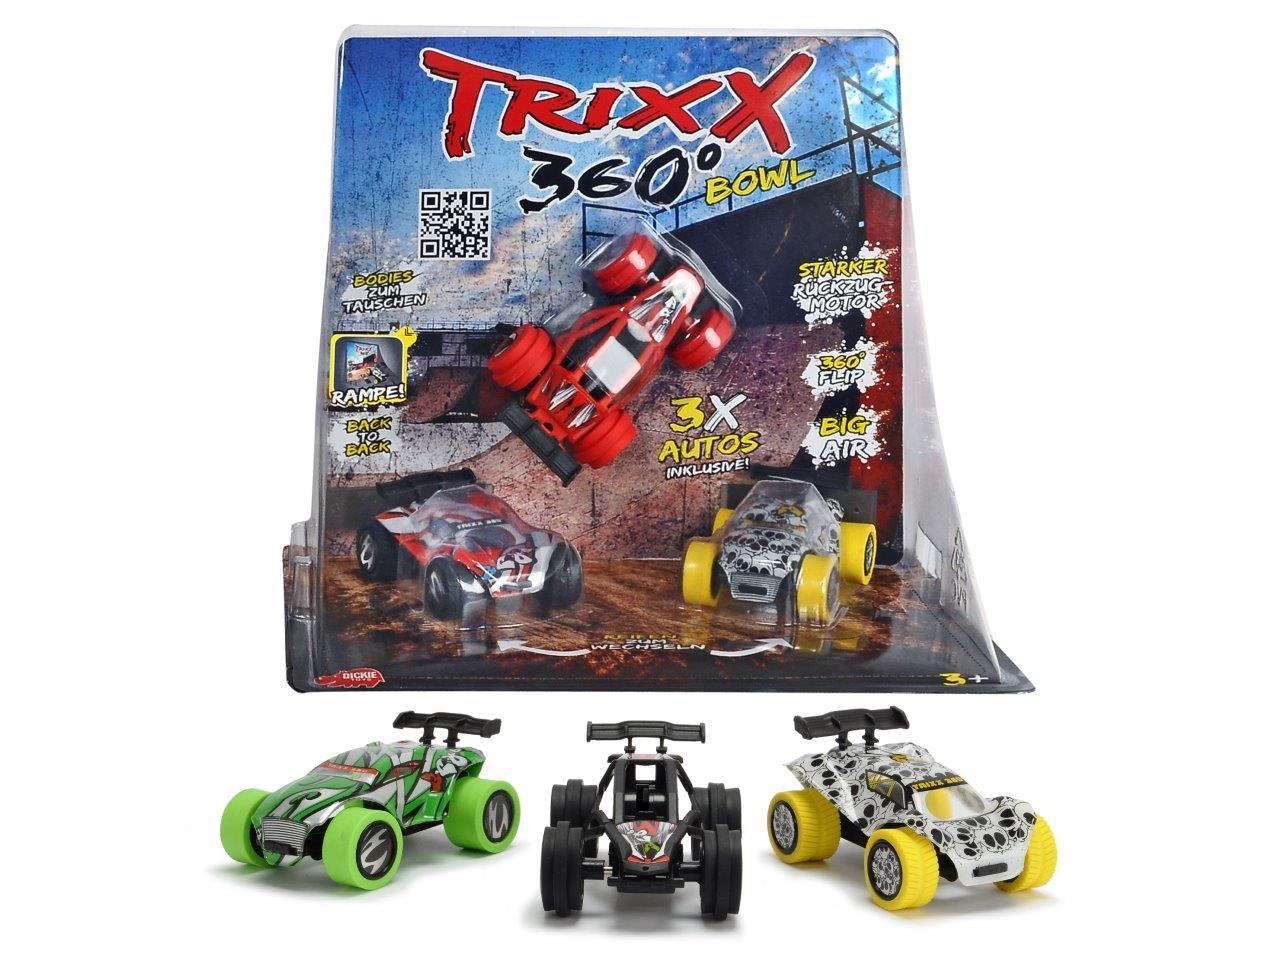 TRXX05 Trixx 360 - Straight Bowl Ramp 2fs